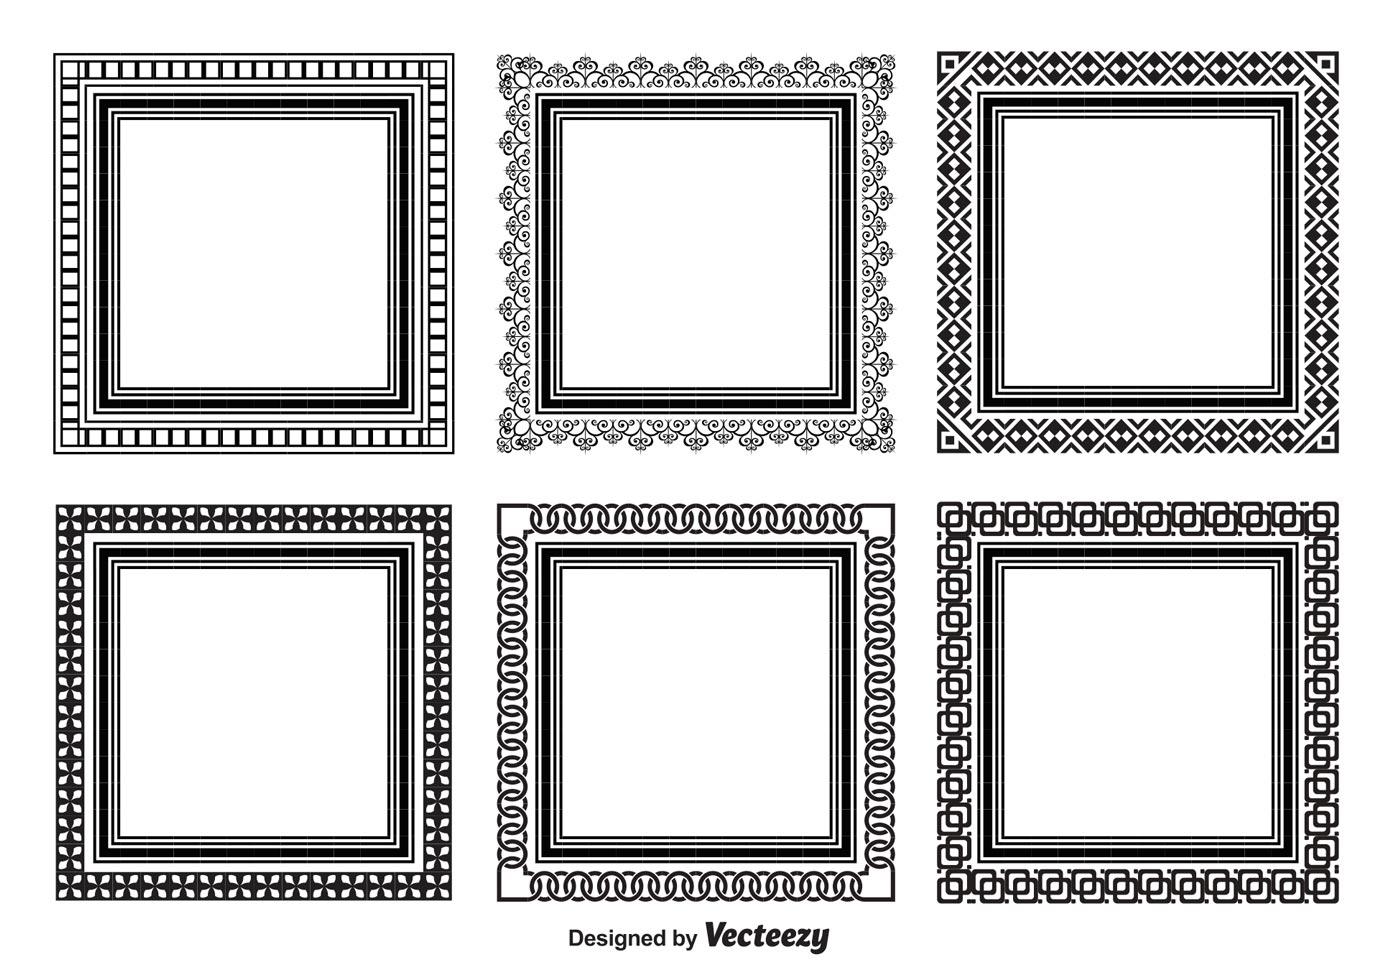 Decorative Square Frame Set - Download Free Vectors ...Fancy Square Frame